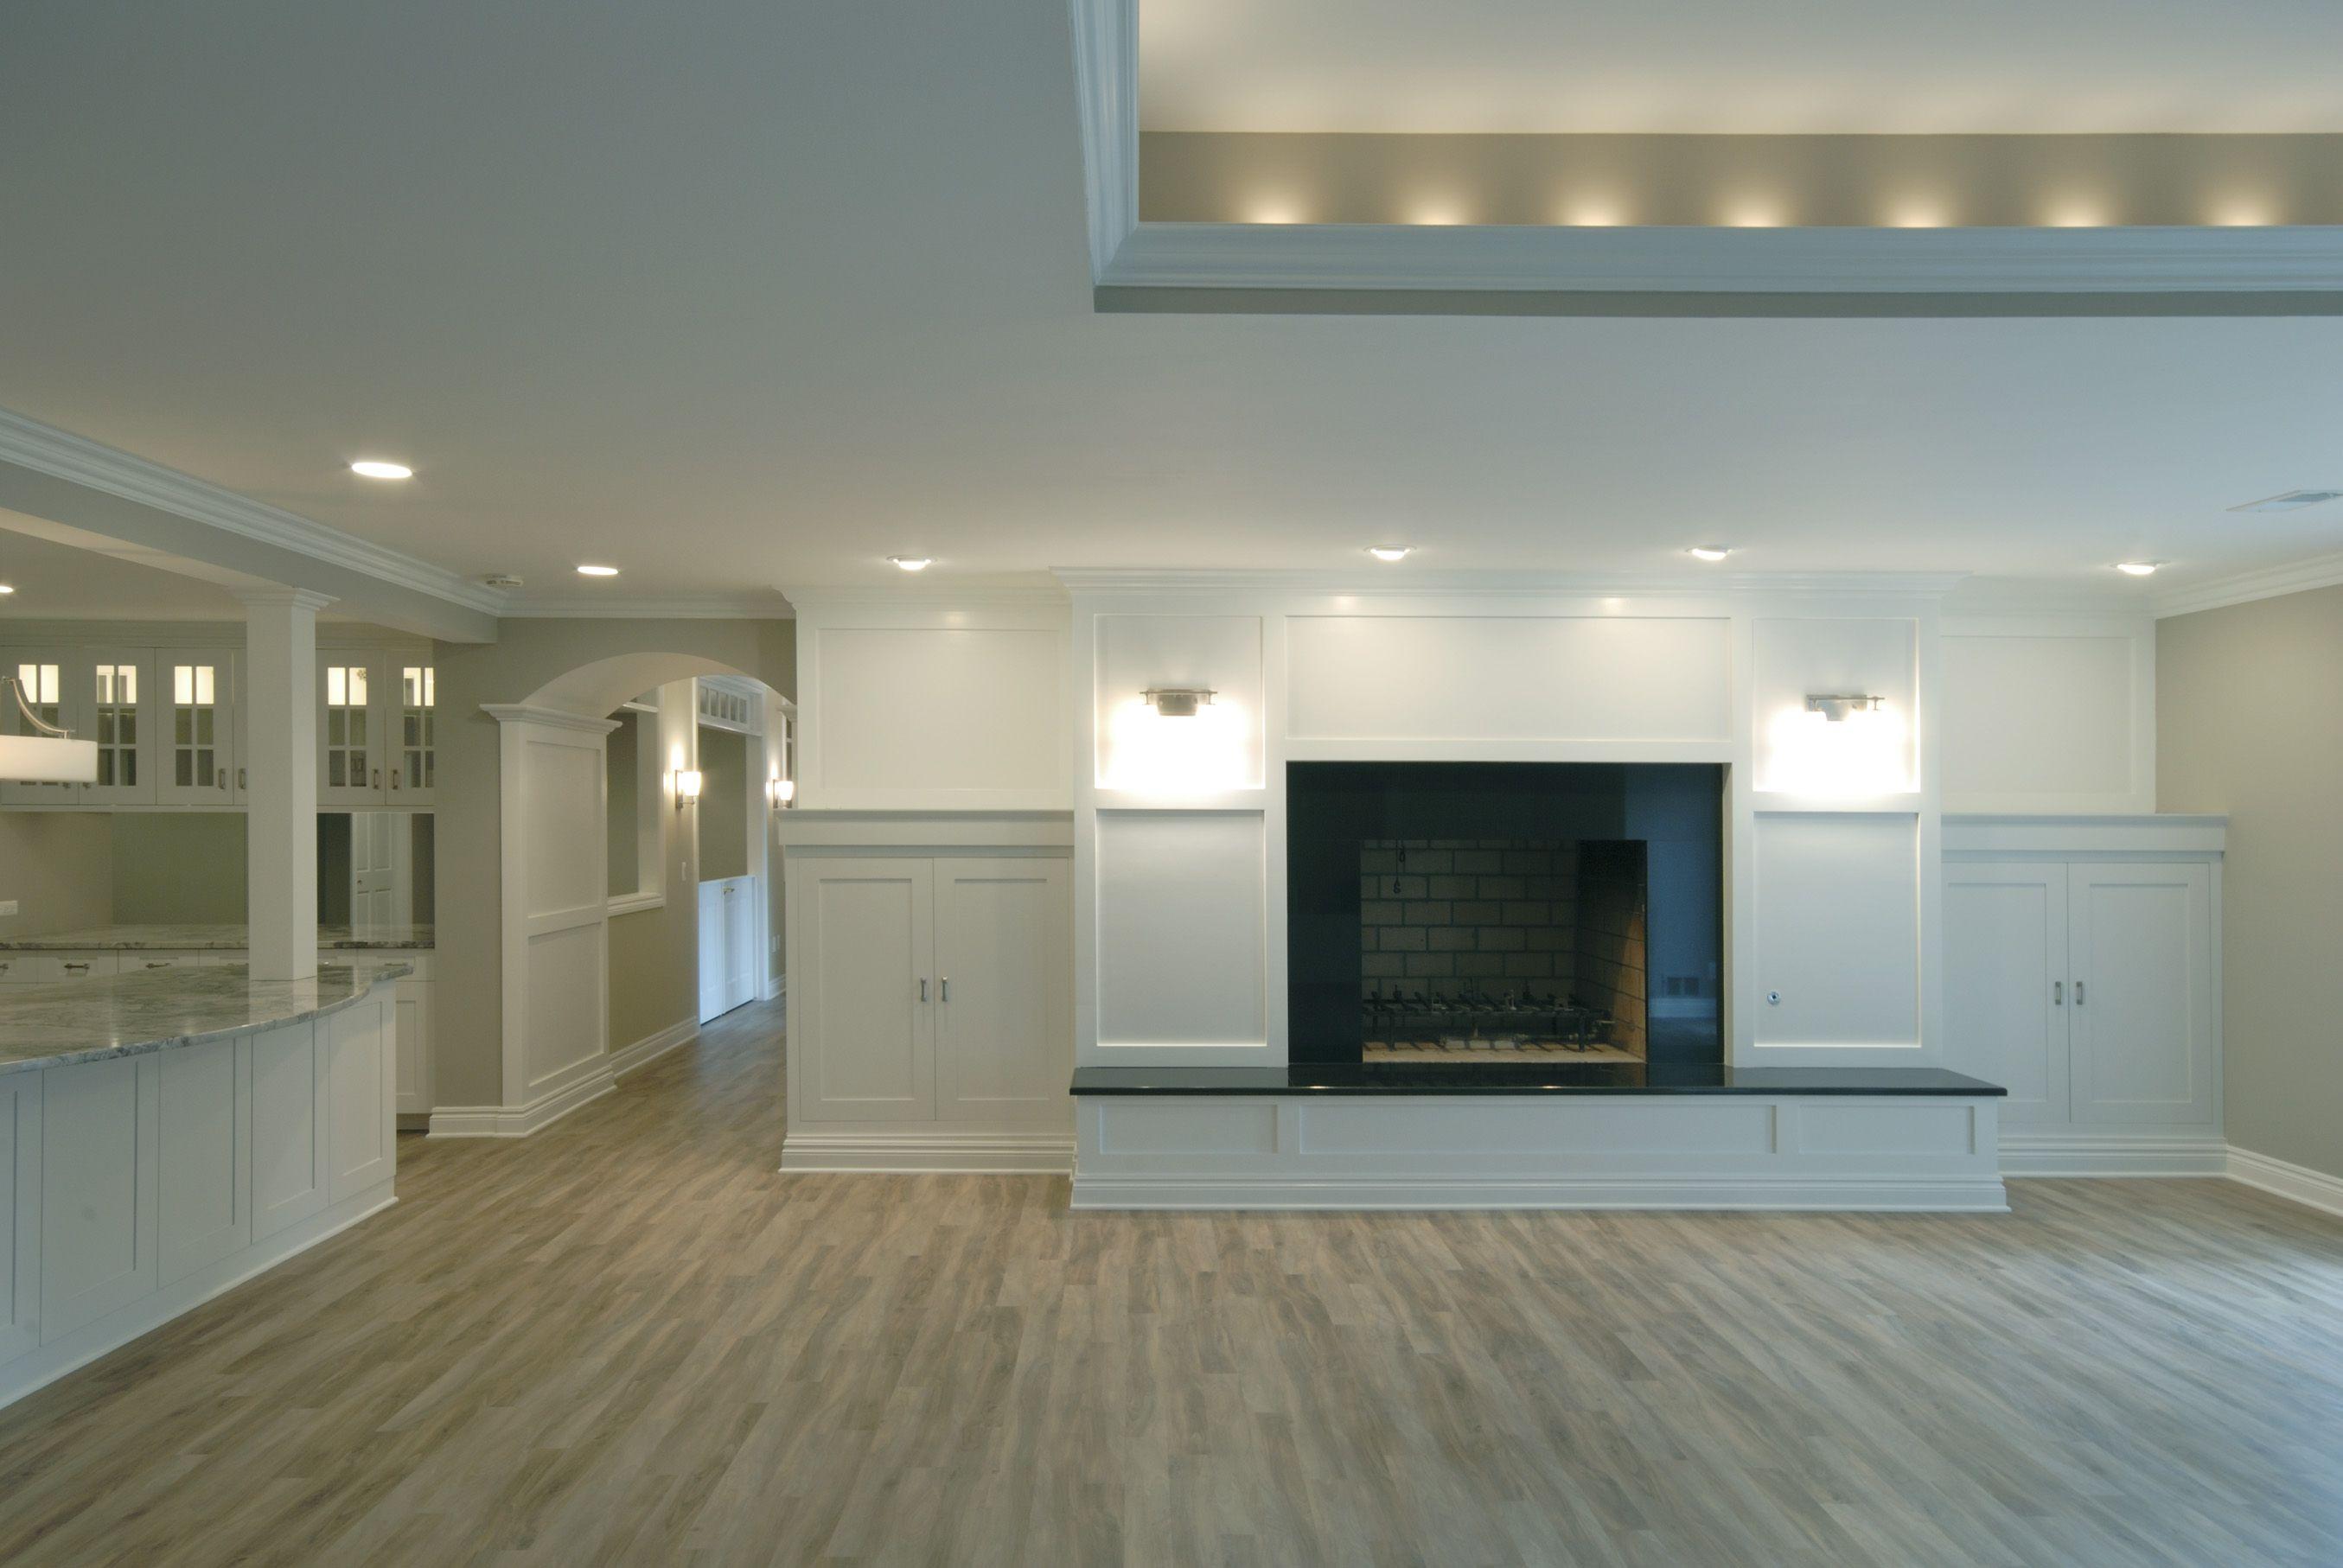 Remodeled Basement Mesmerizing Design Review